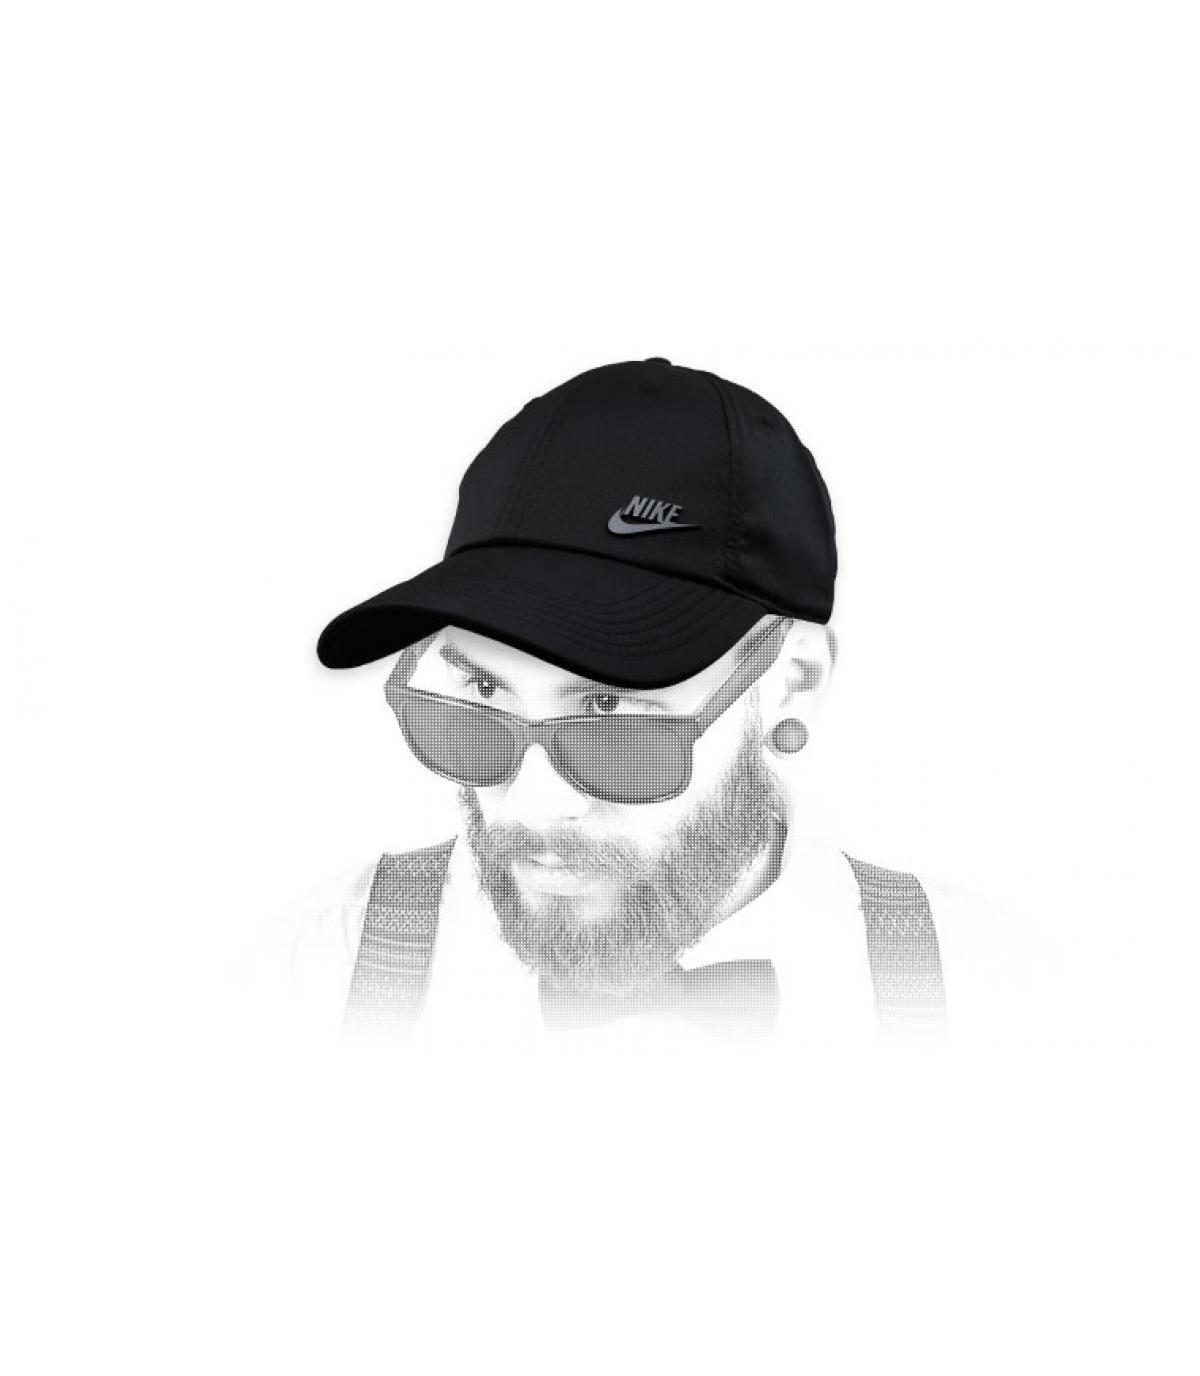 black Nike cap logo